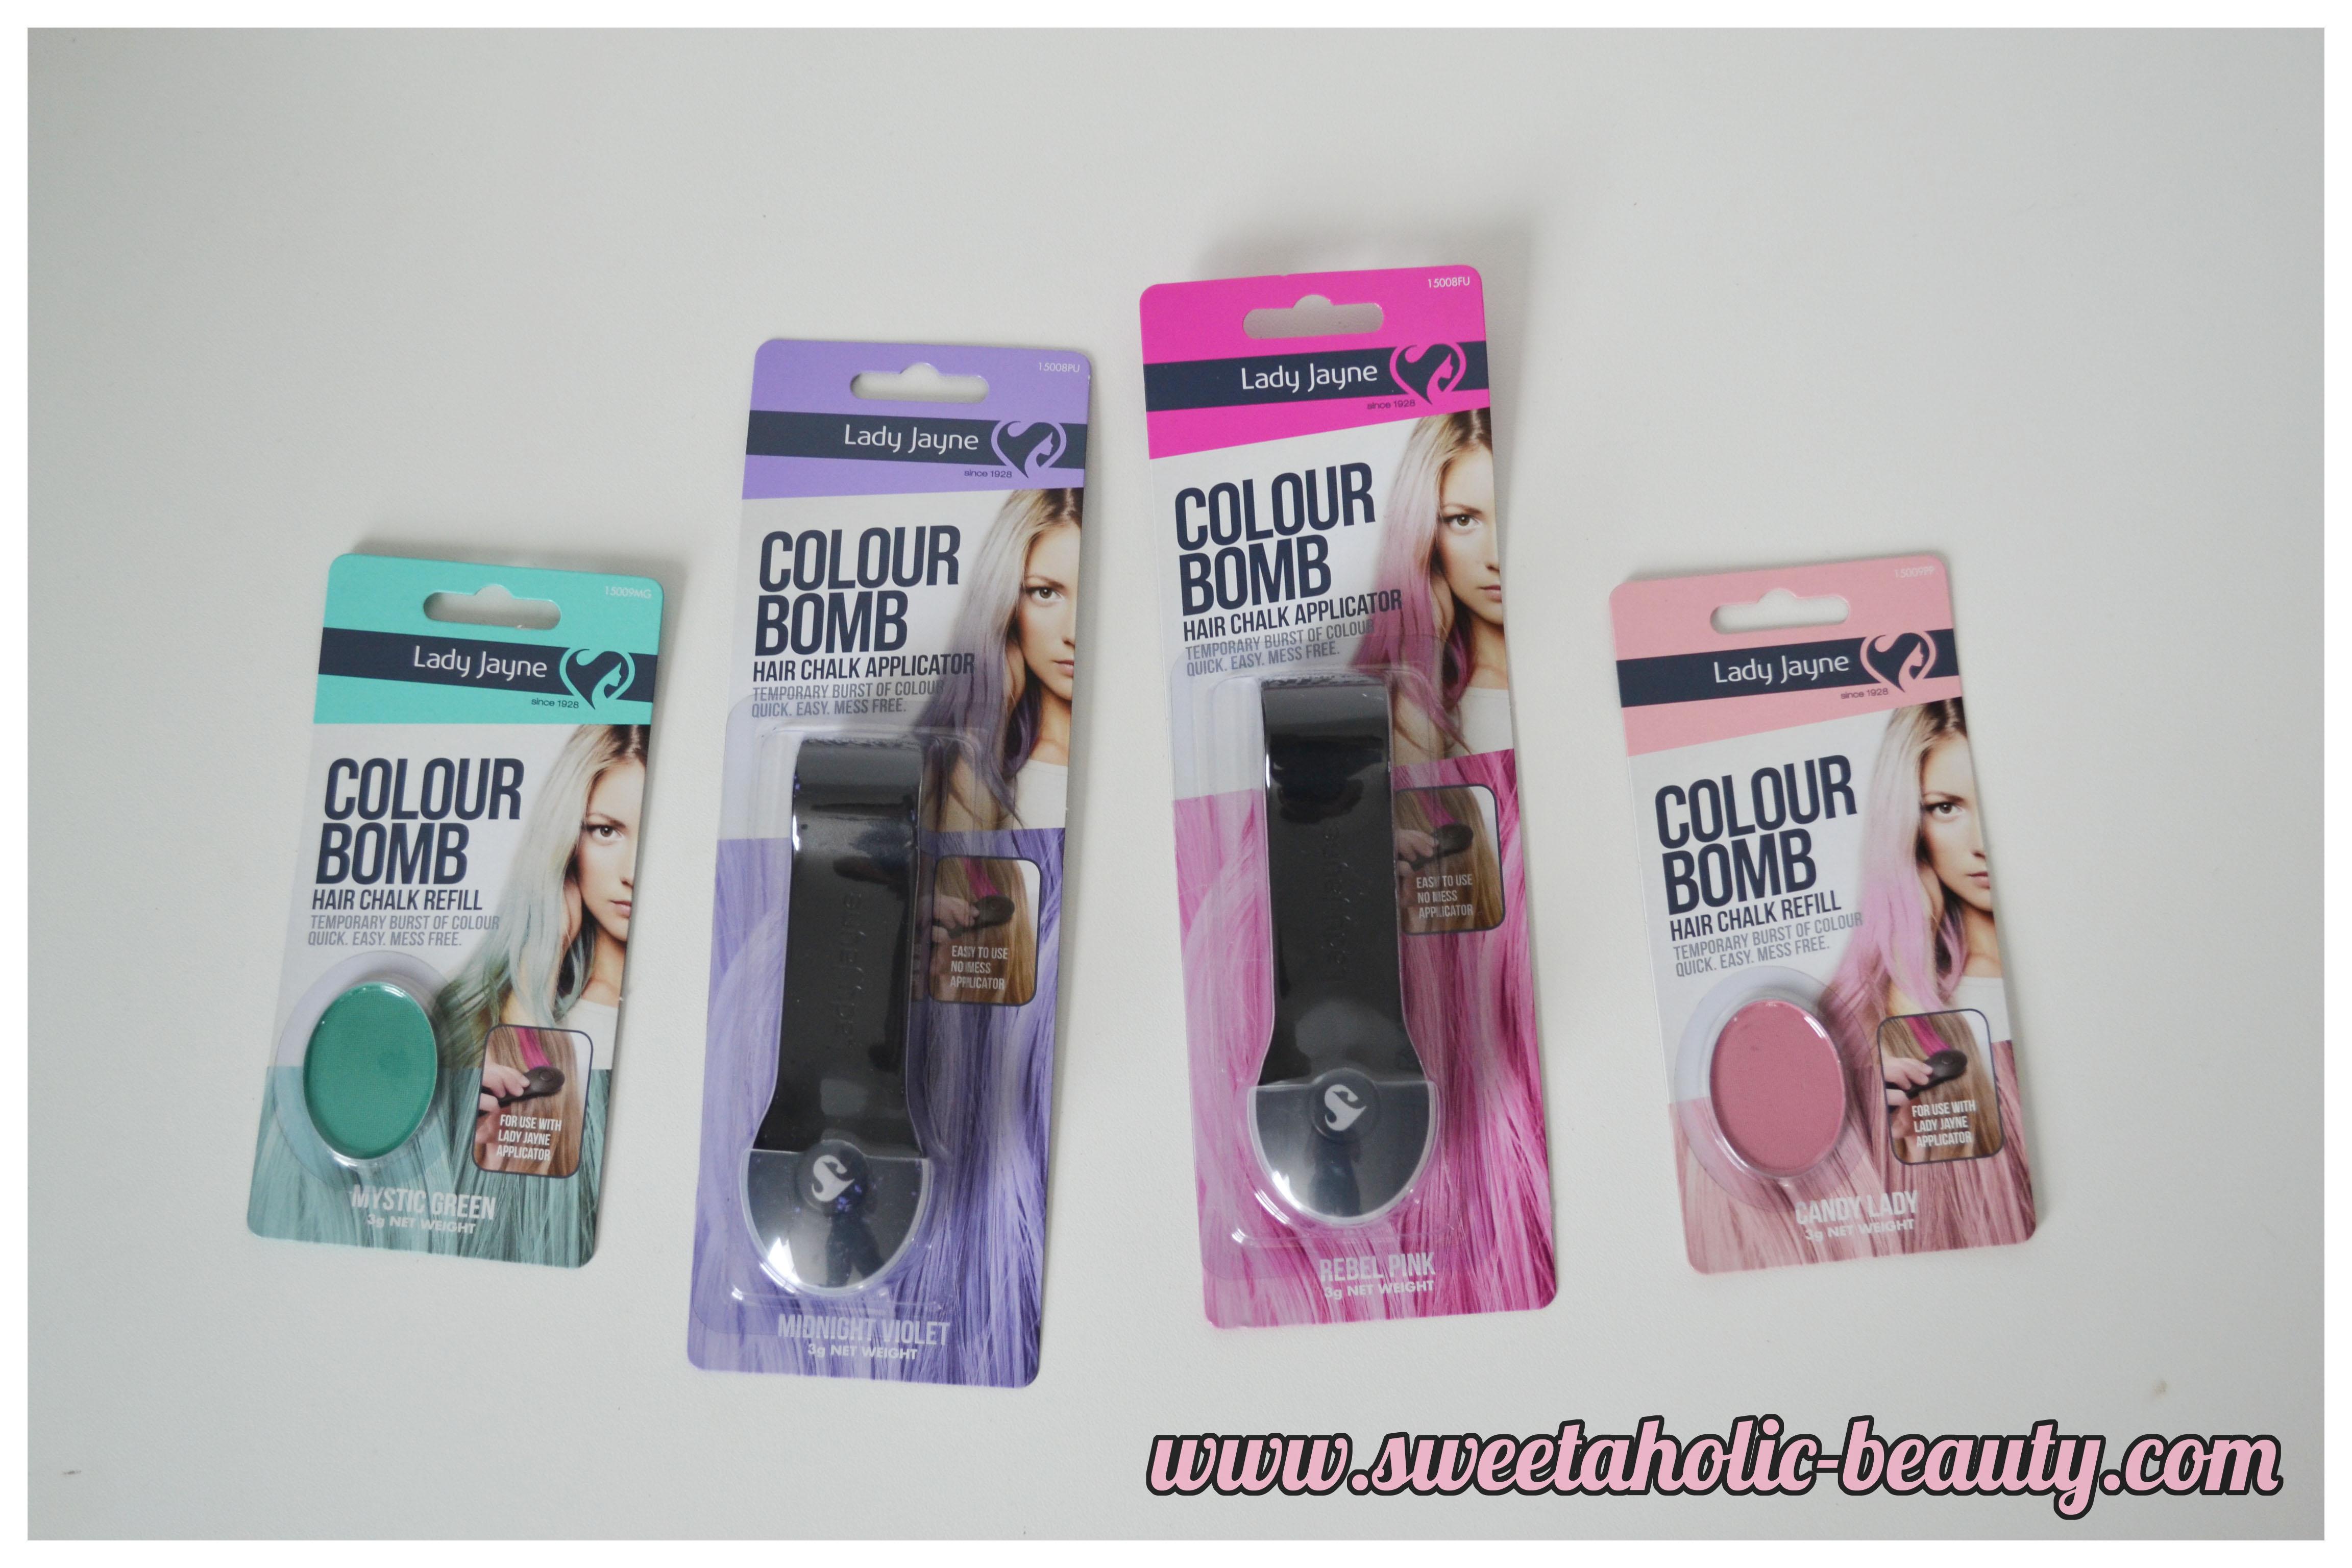 Lady Jayne Colour Bomb Hair Chalk* | Sweetaholic Beauty